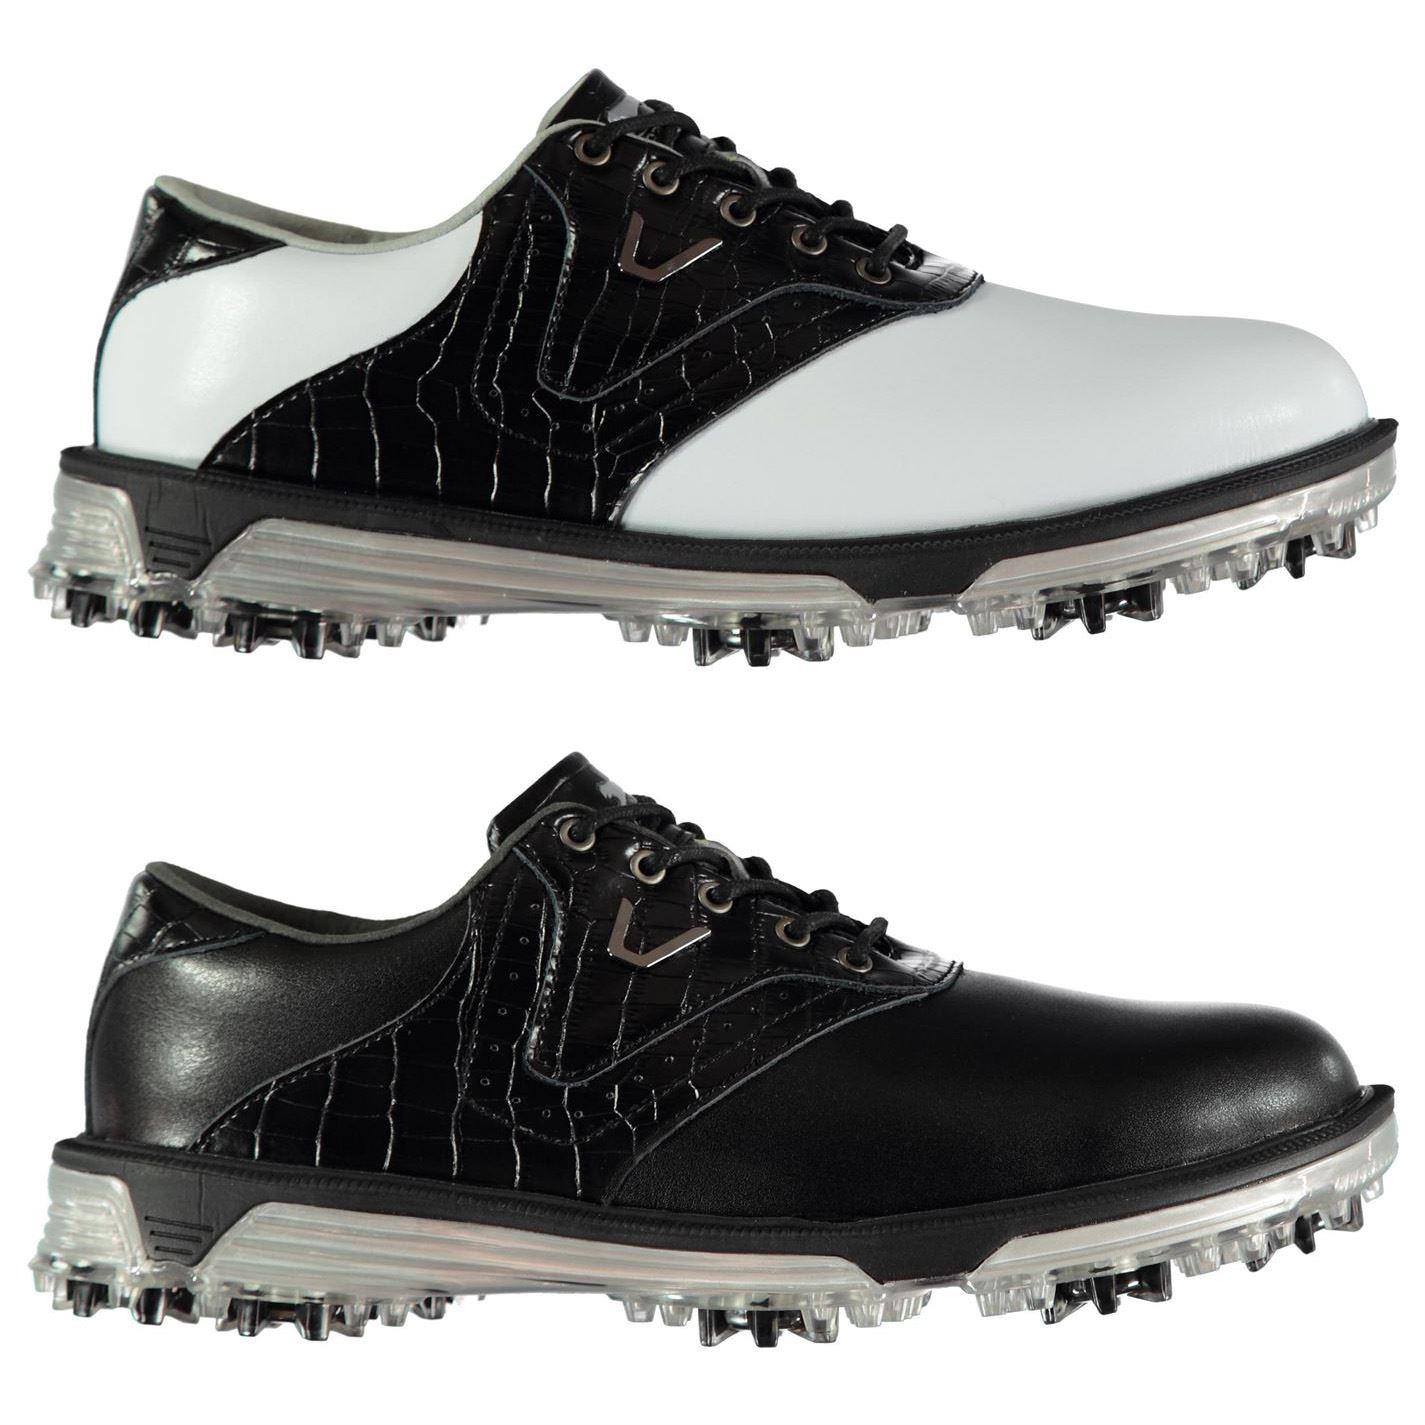 133c6dd9dca ... Slazenger V500 Golf Shoes Mens Spikes Footwear ...